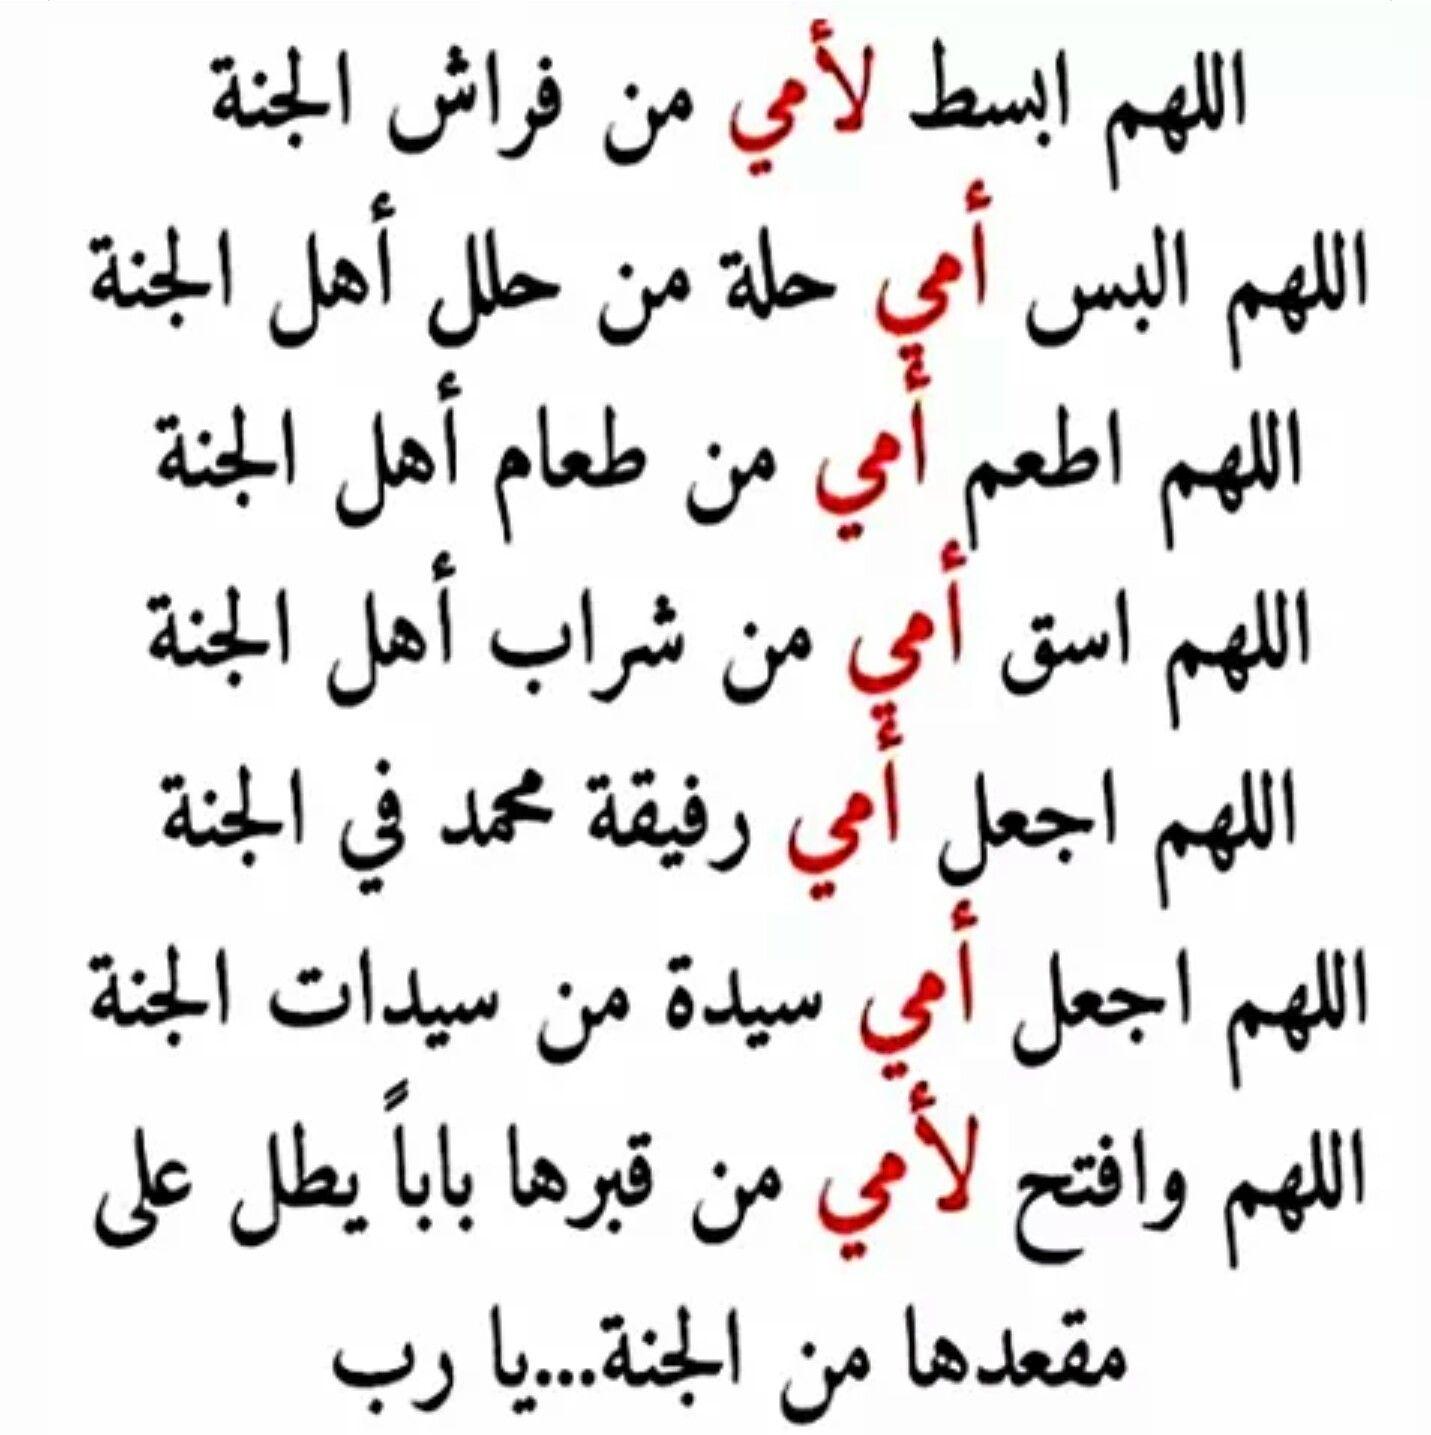 Desertrose اللهم آمين يارب العالمين Quran Quotes Love Quran Quotes Inspirational Islamic Quotes